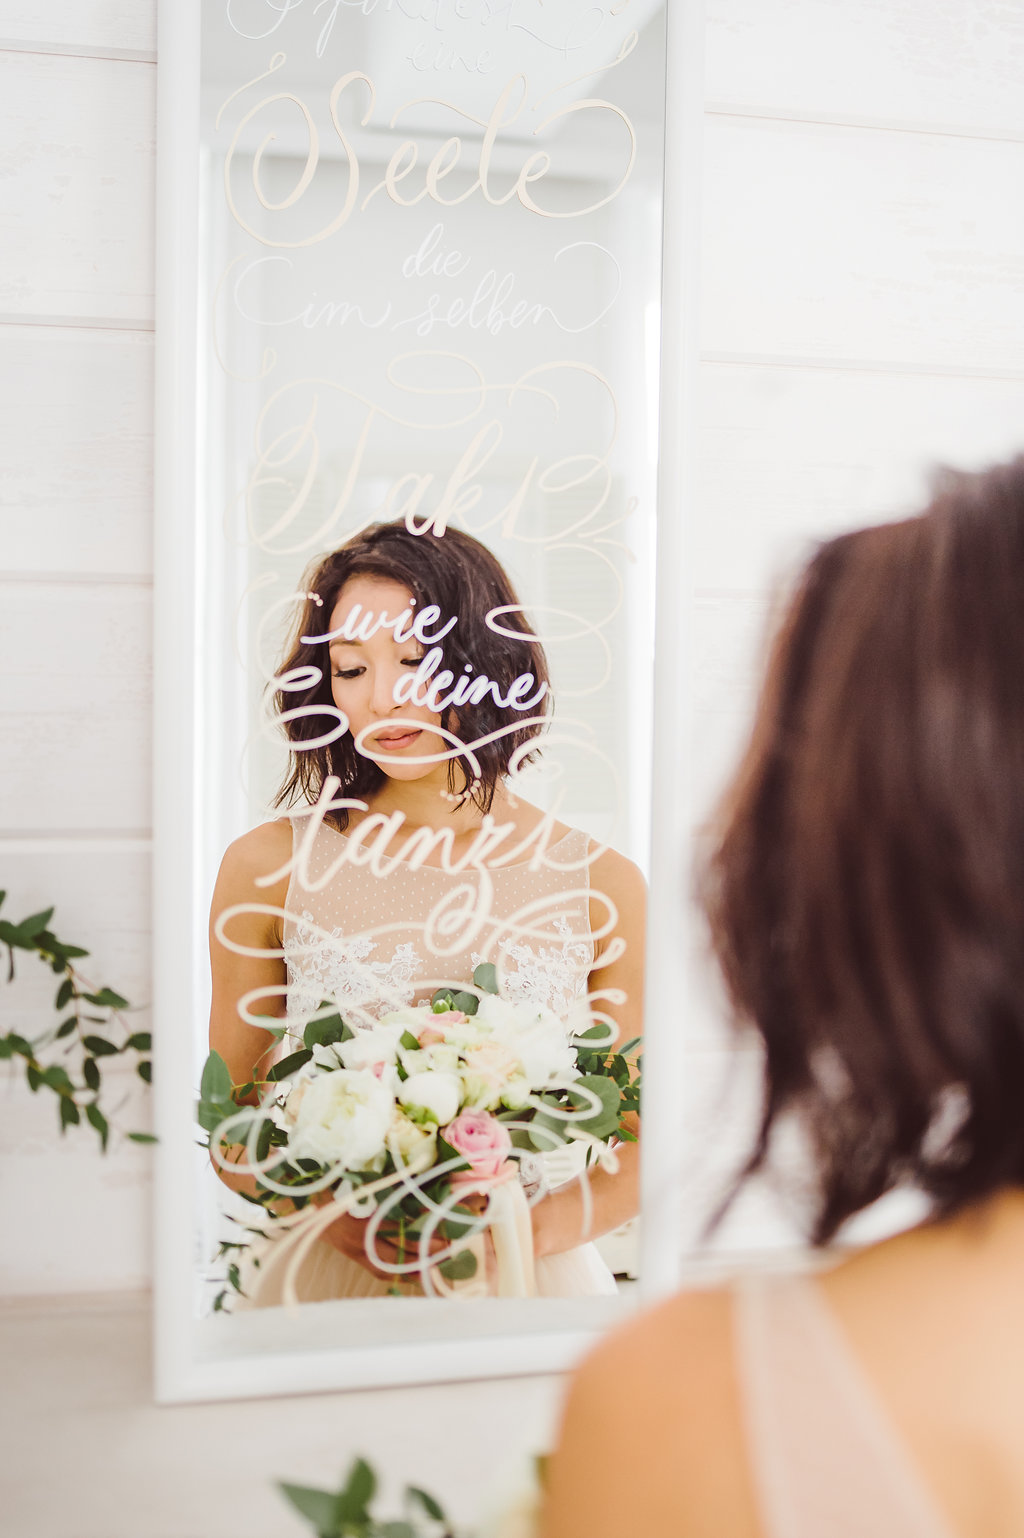 ballerina bride kalligraphie